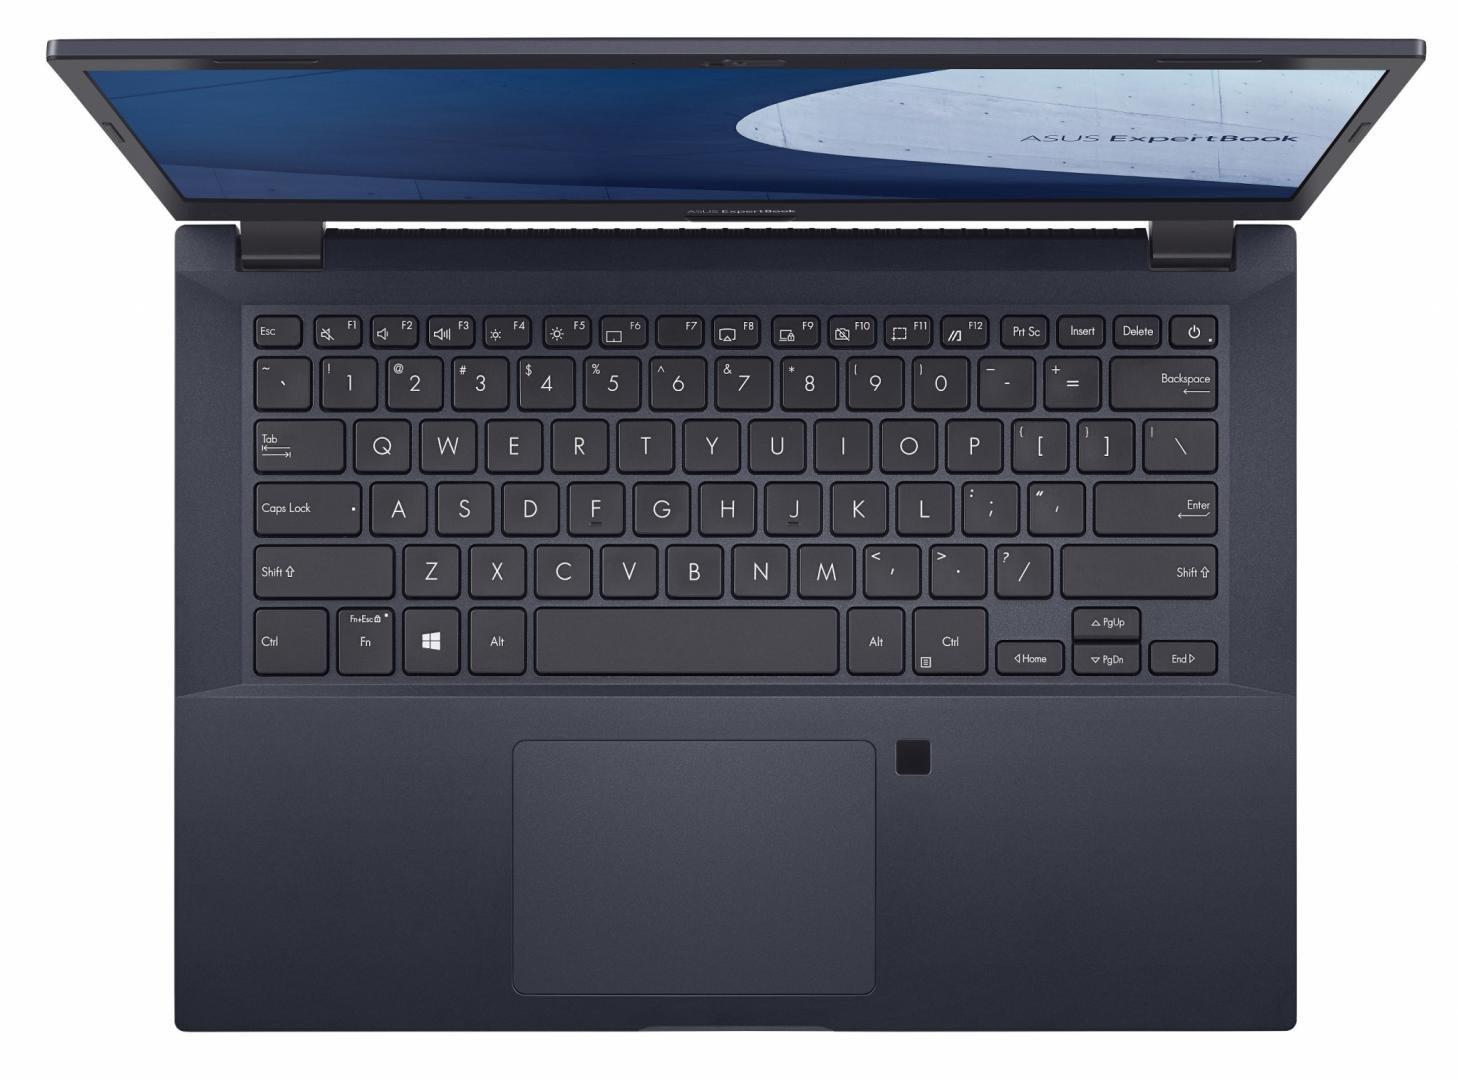 Laptop SMB ASUS ExpertBook P2 P2451FA-EK0174, 14 FHD (1920x1080), Anti- glare (mat), deschidere lid  - imaginea 4